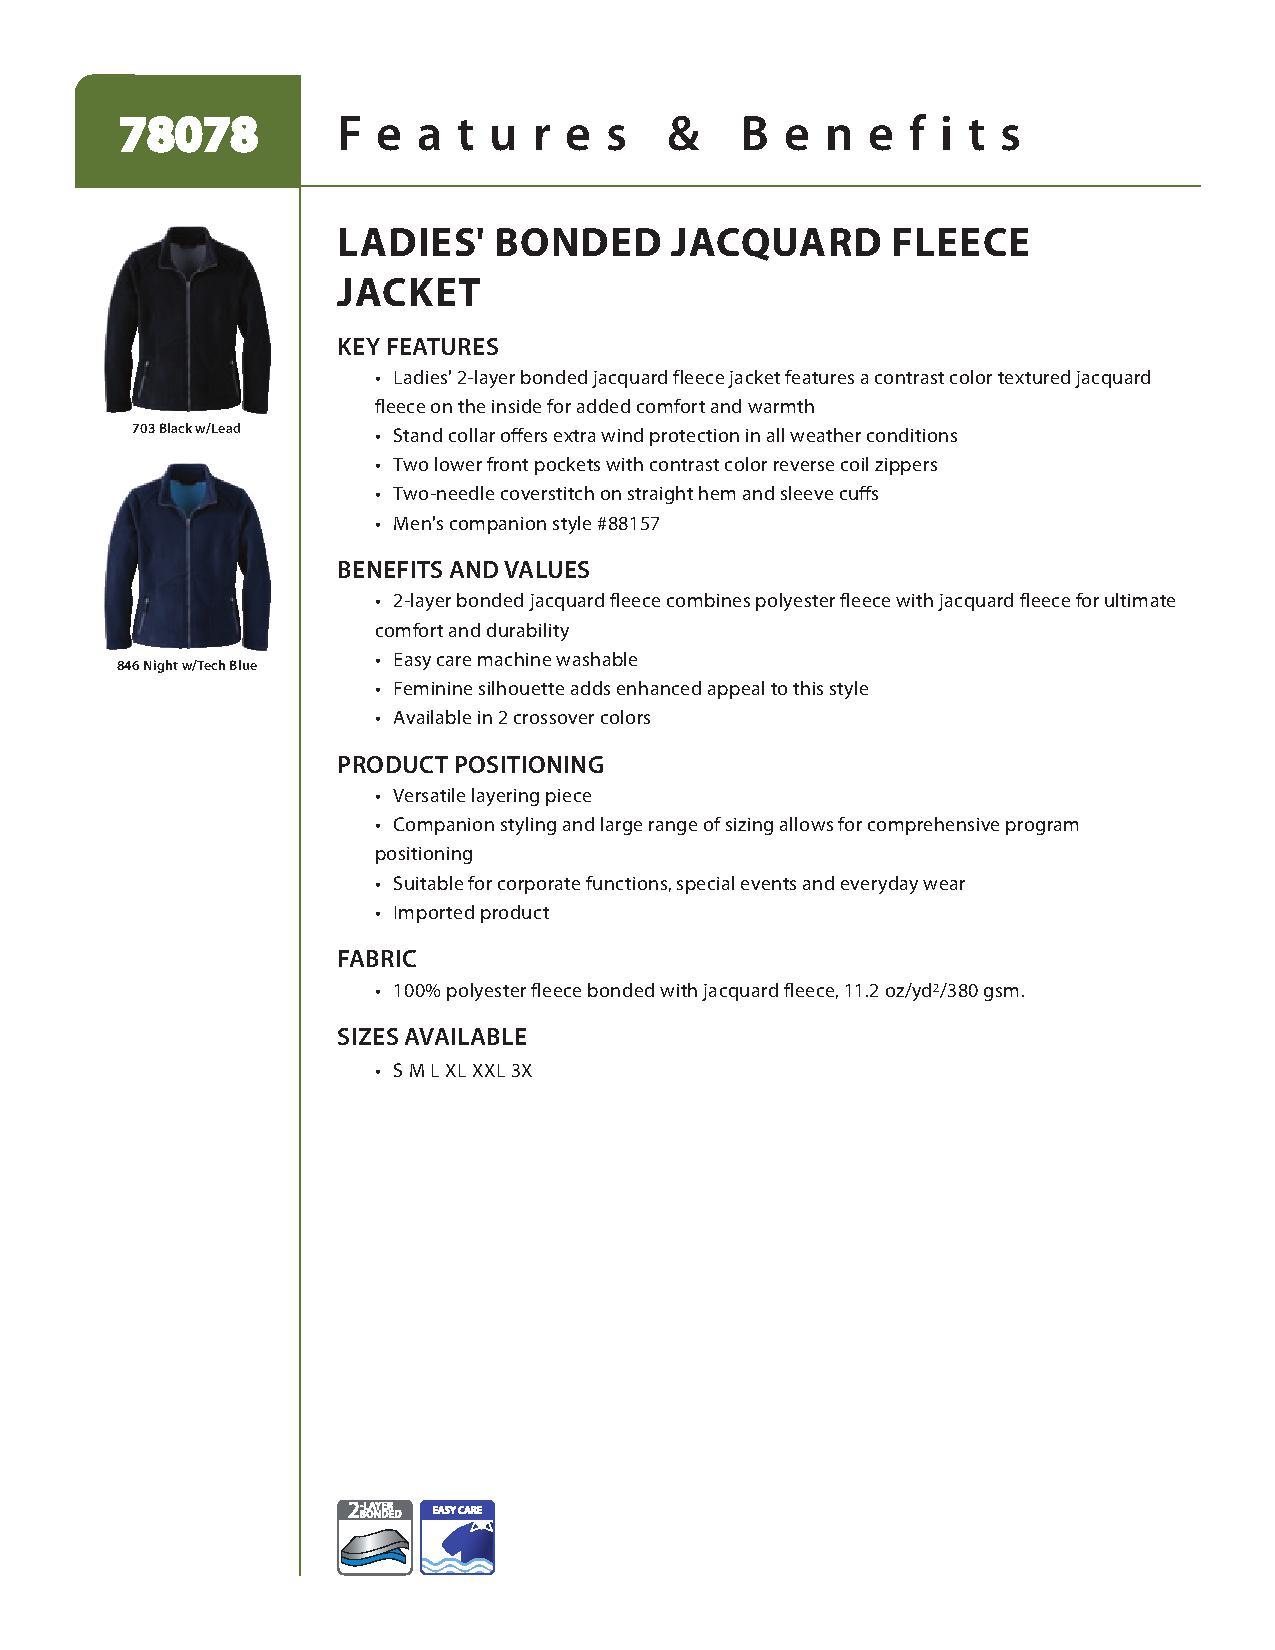 Ash City Bonded Fleece 78078 - Ladies' Bonded Jacquard Fleece Jacket